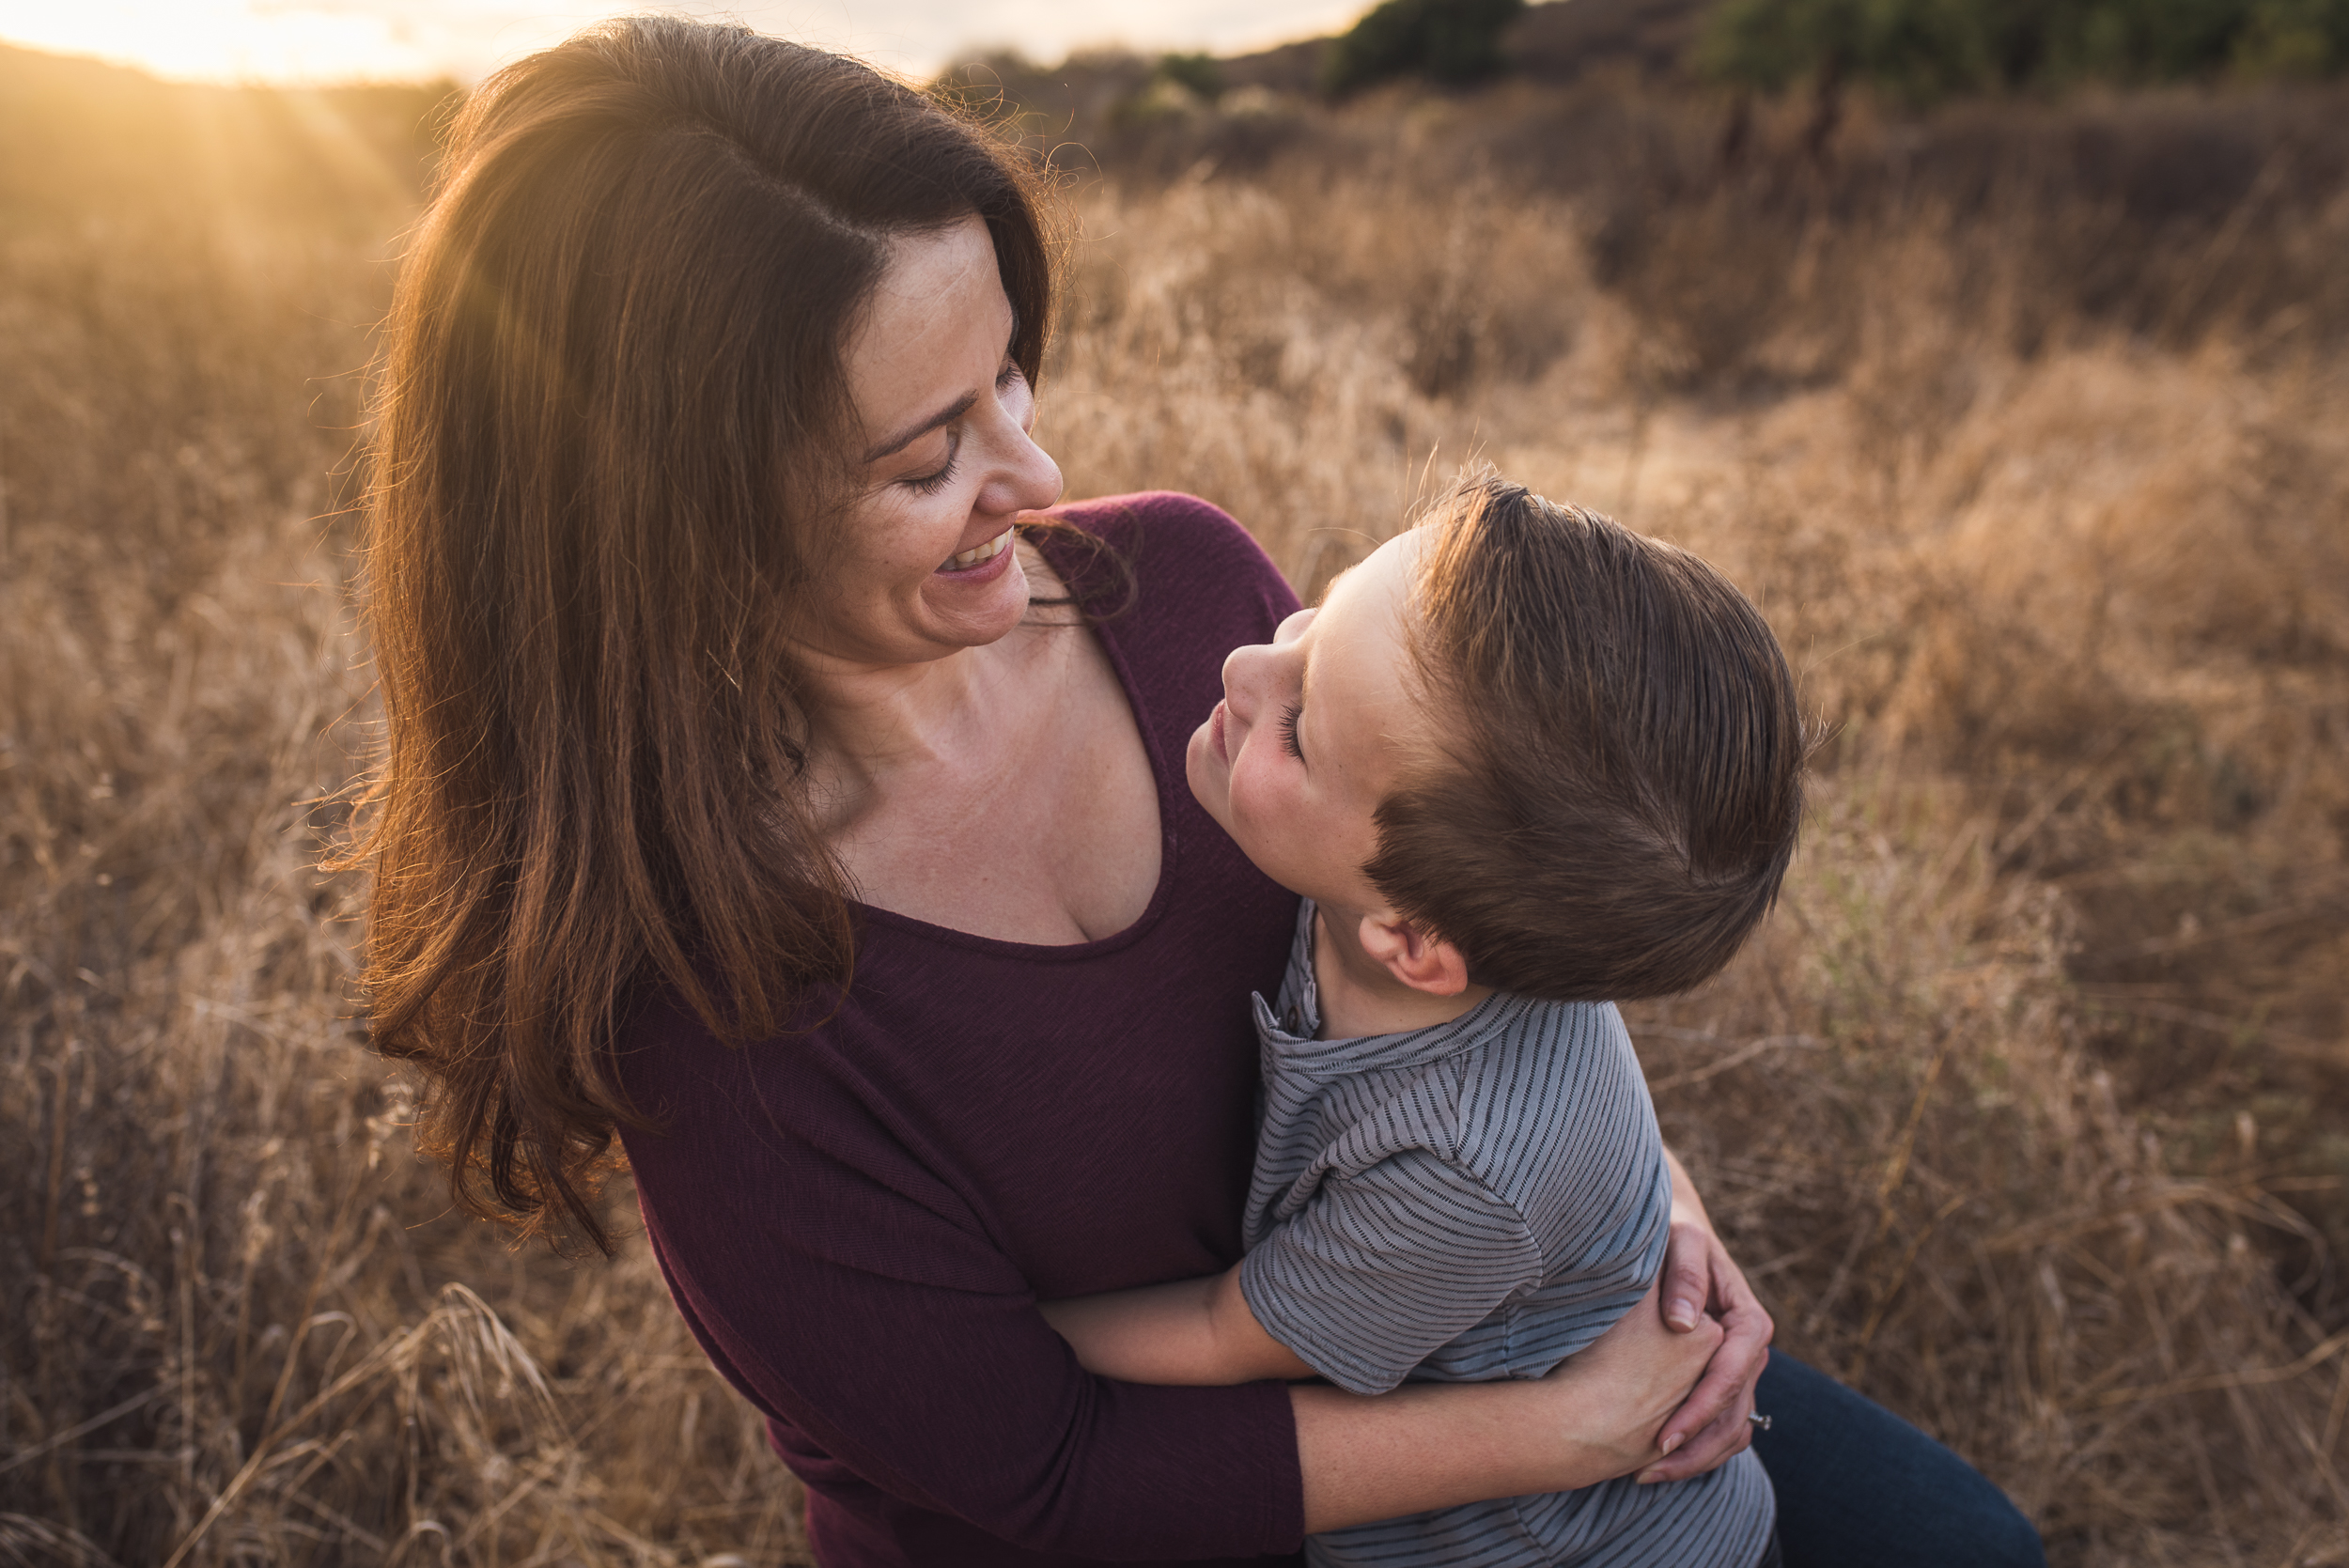 2018-San-Diego-Family-Lifestyle-Newborn-Travel-Vacation-Photographer-Kelsey-Smith-Photography-Coronado-La-Jolla-Encinitas-Solana-Beach-Del-Mar-73.jpg